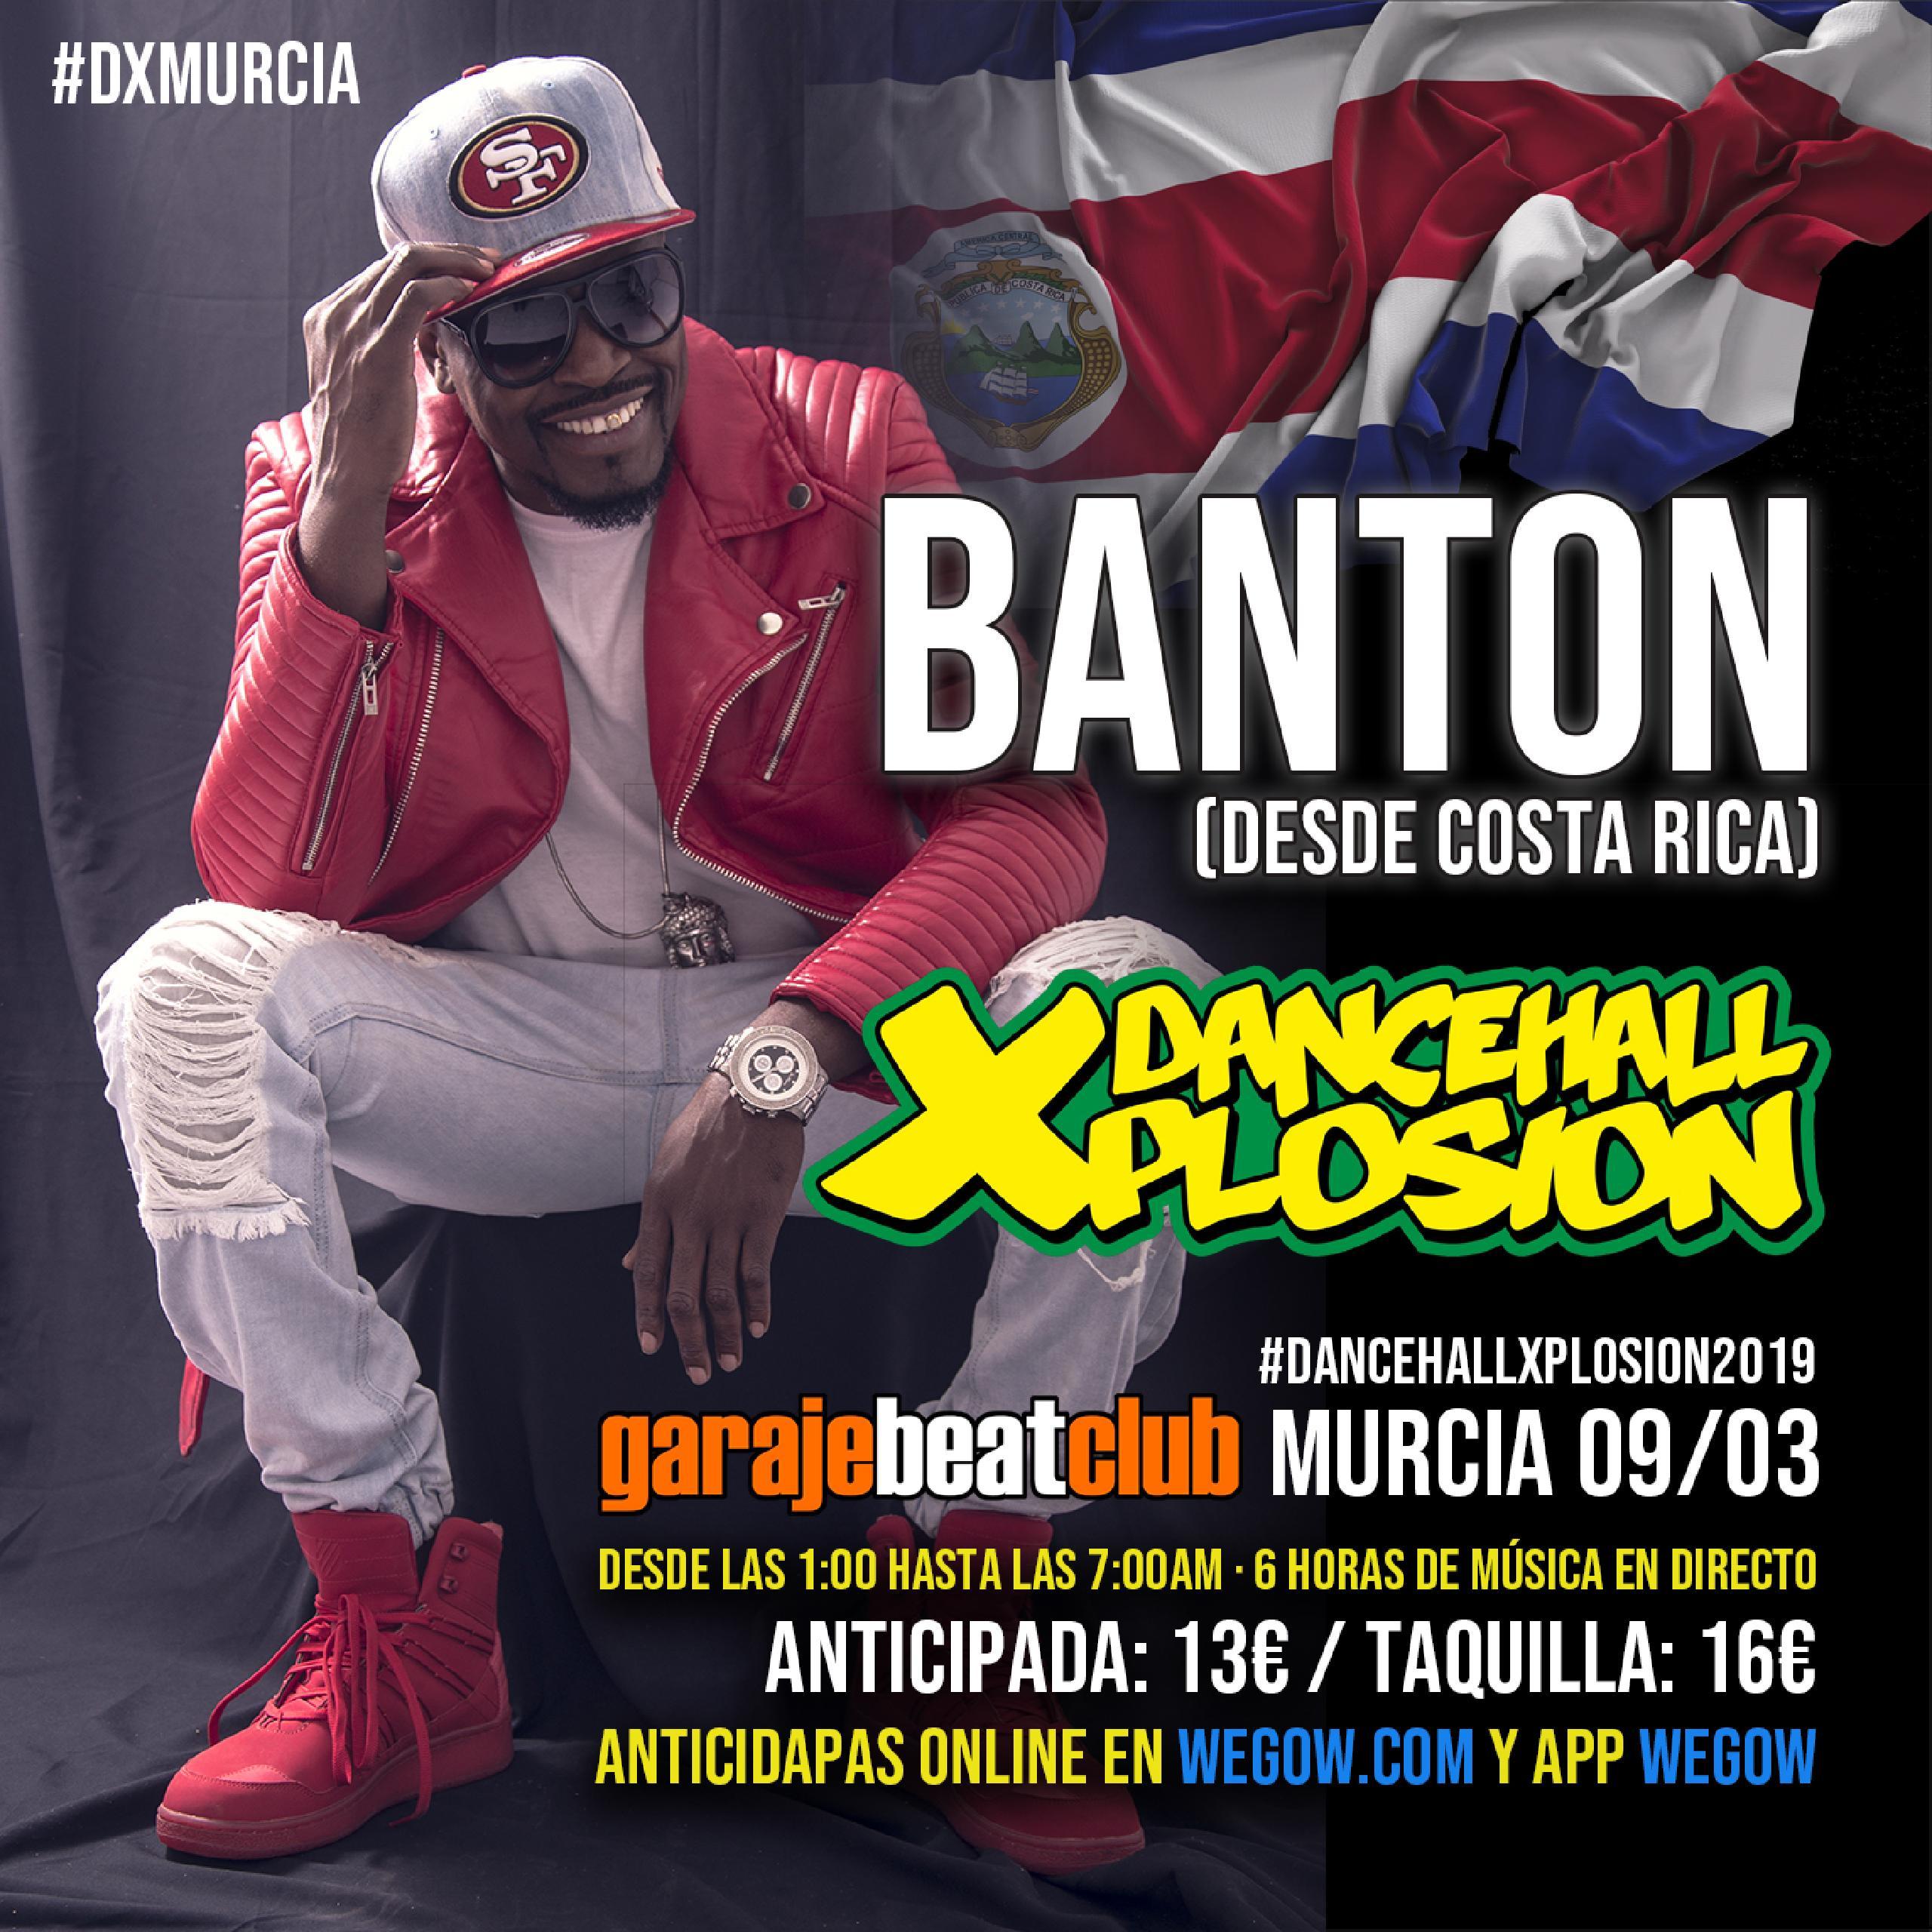 Banton desde Costa Rica en Murcia